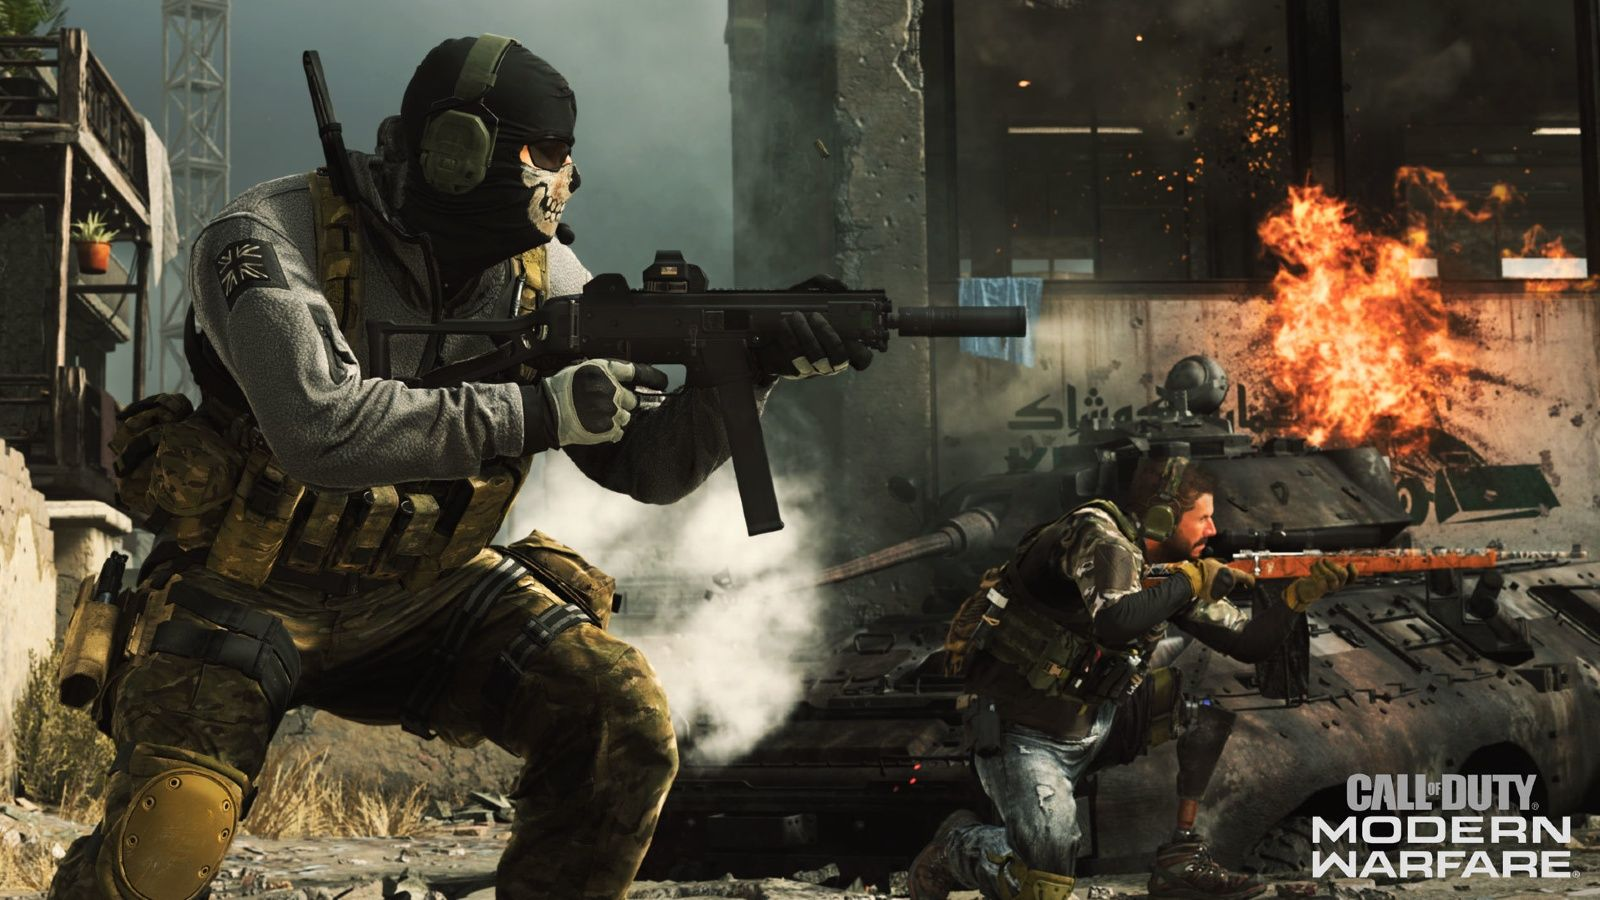 Call of Duty: Modern Warfare Ghost Infinity Ward